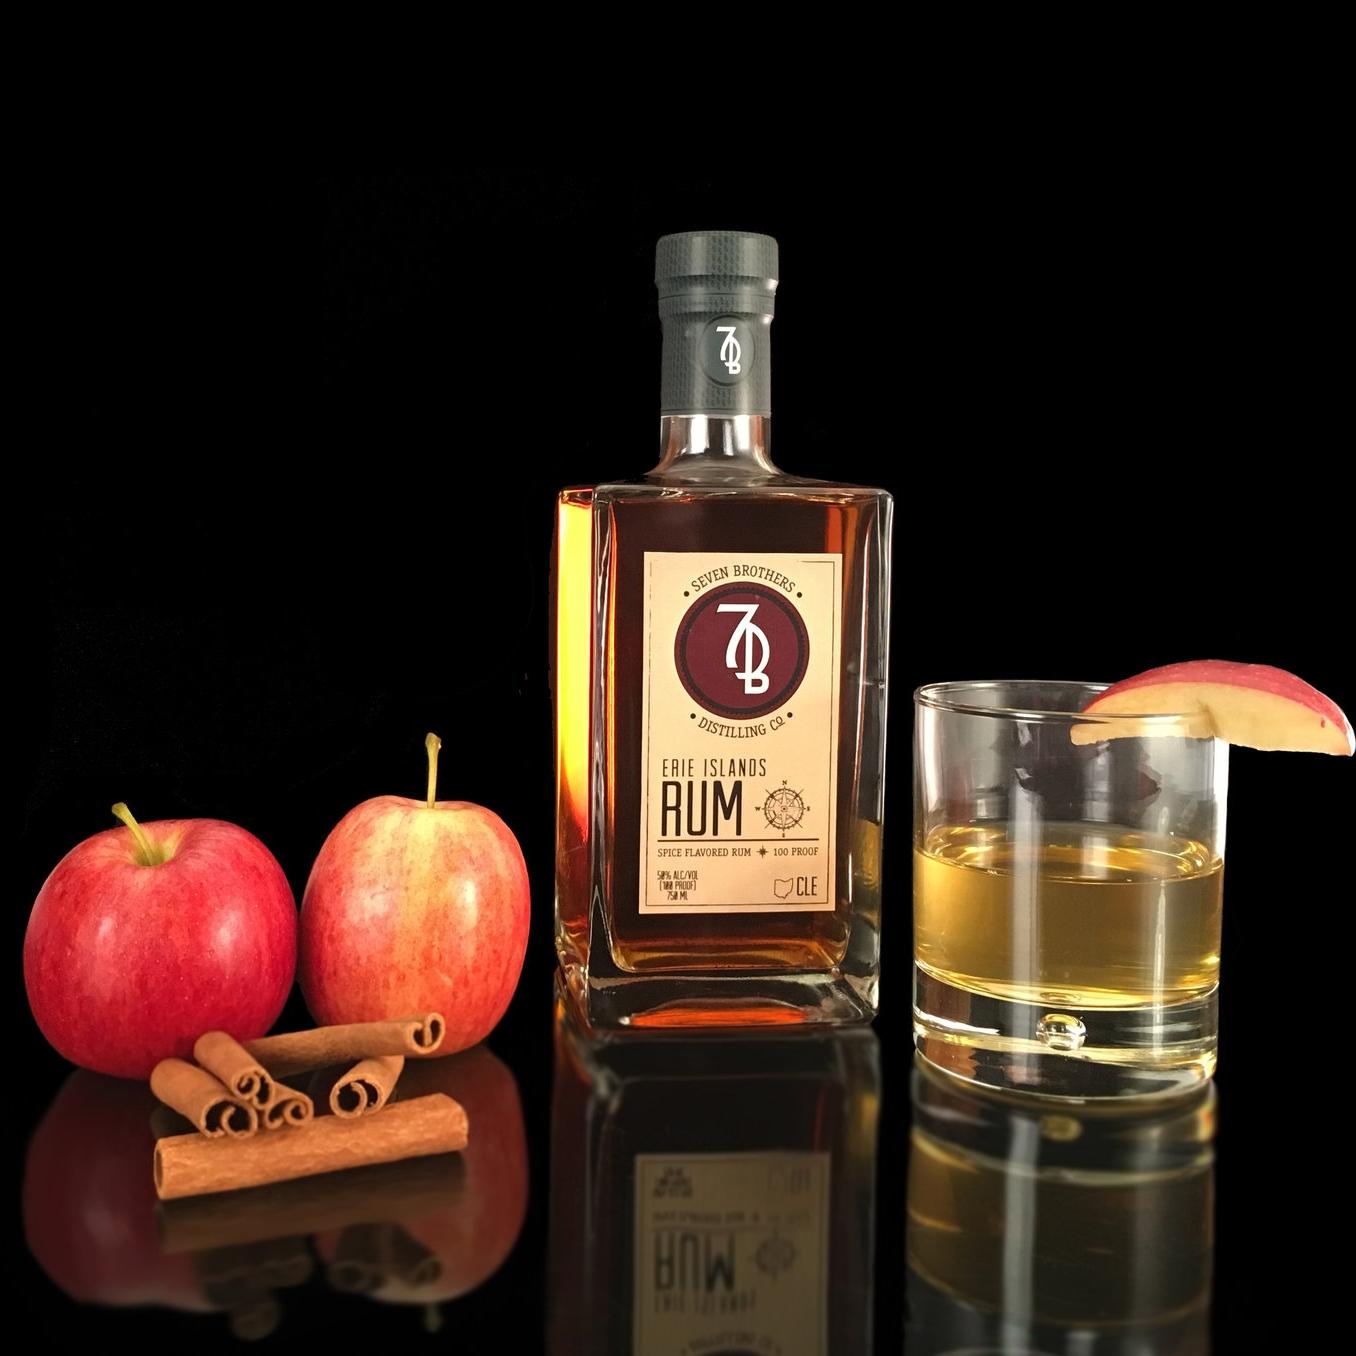 Erie Islands Spiced Rum